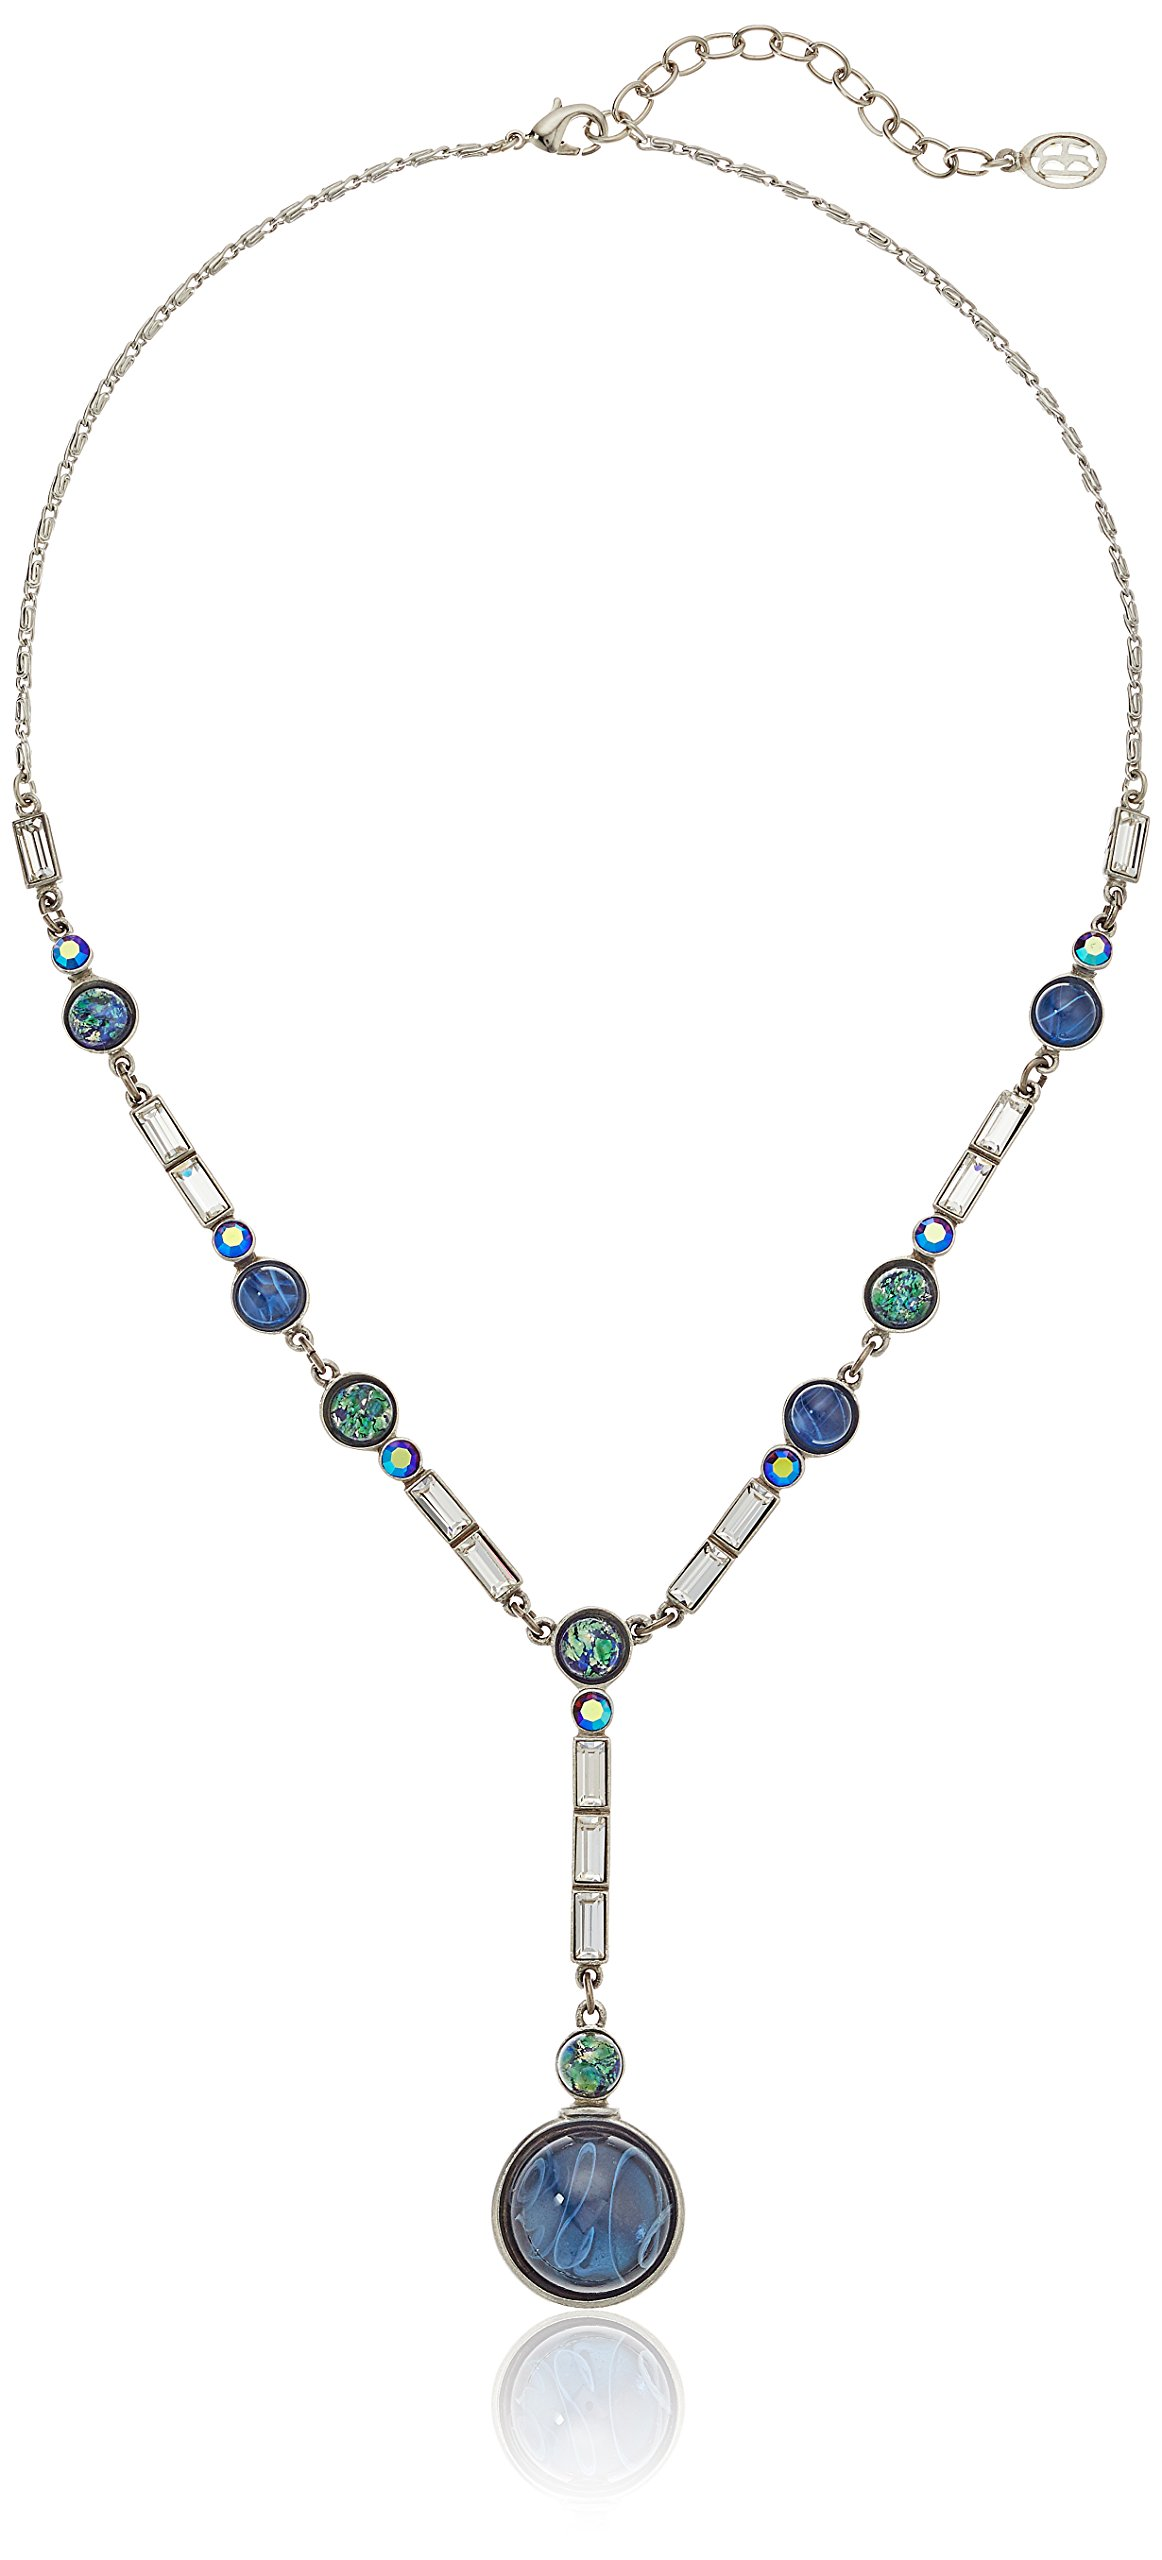 Ben-Amun Jewelry Eclipse Lunar Swarovski Crystal Y-Shaped Necklace